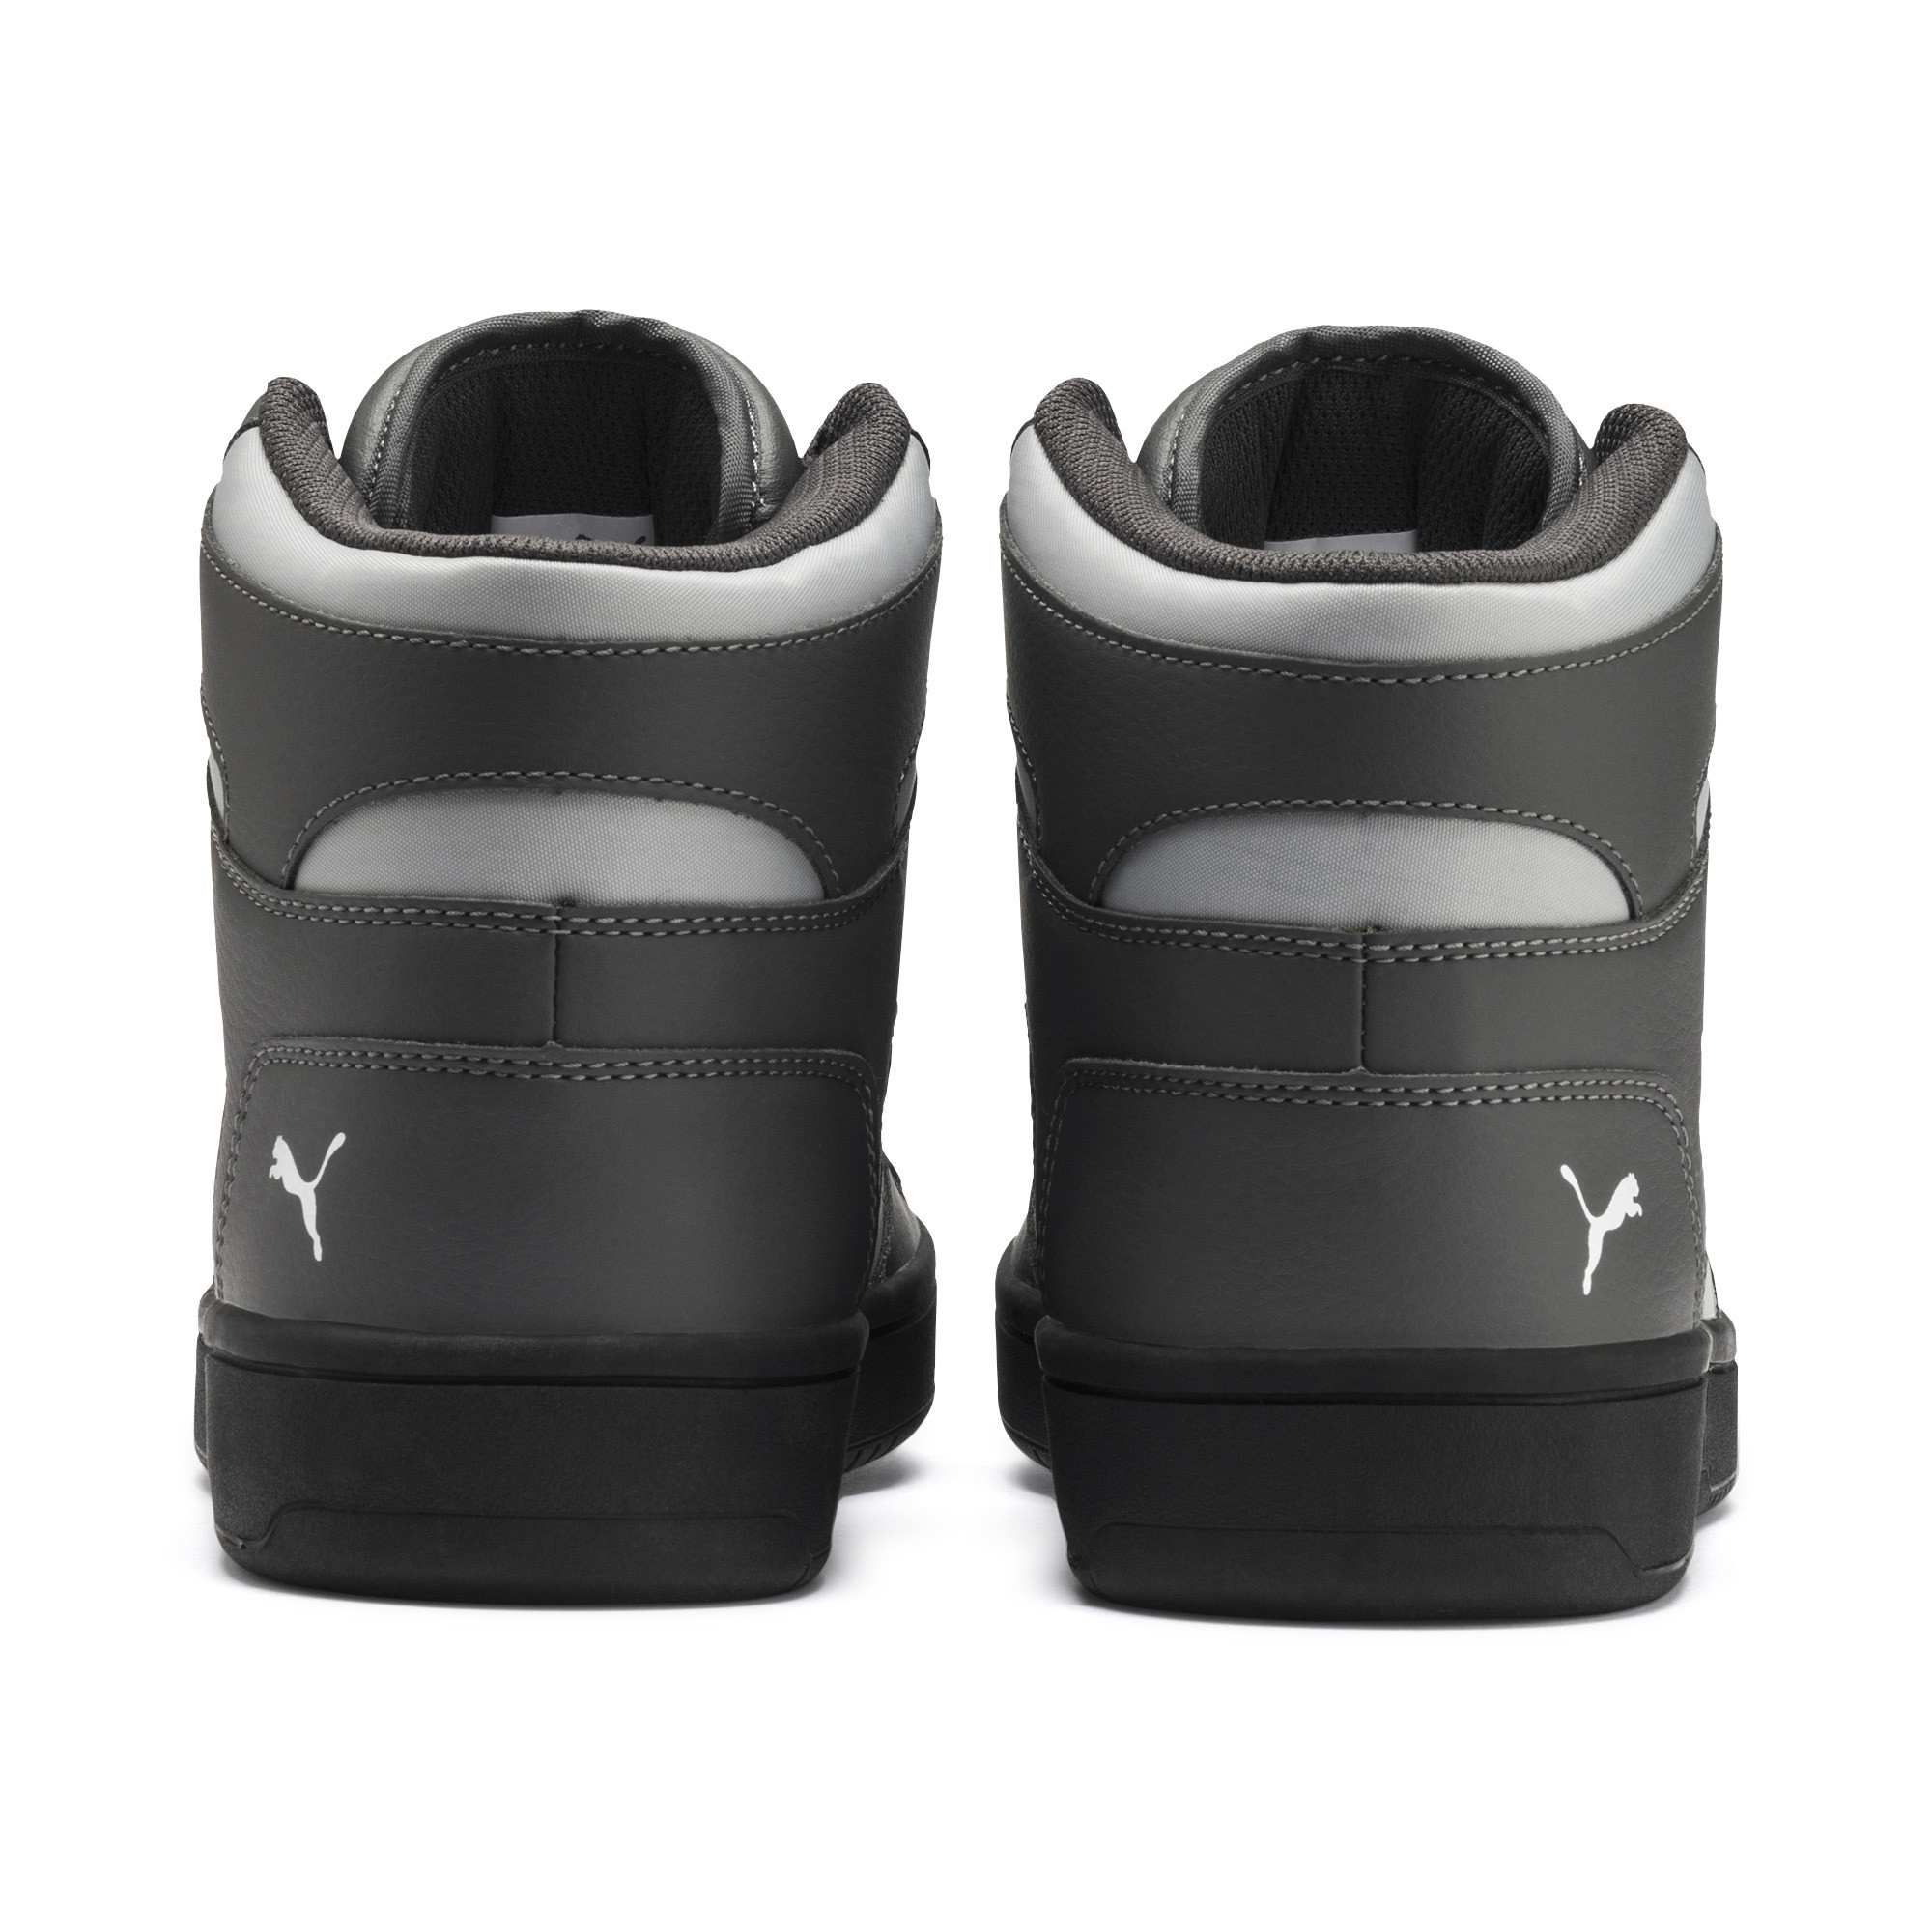 PUMA-PUMA-Rebound-LayUp-Men-039-s-Sneakers-Men-Mid-Boot-Basics thumbnail 13